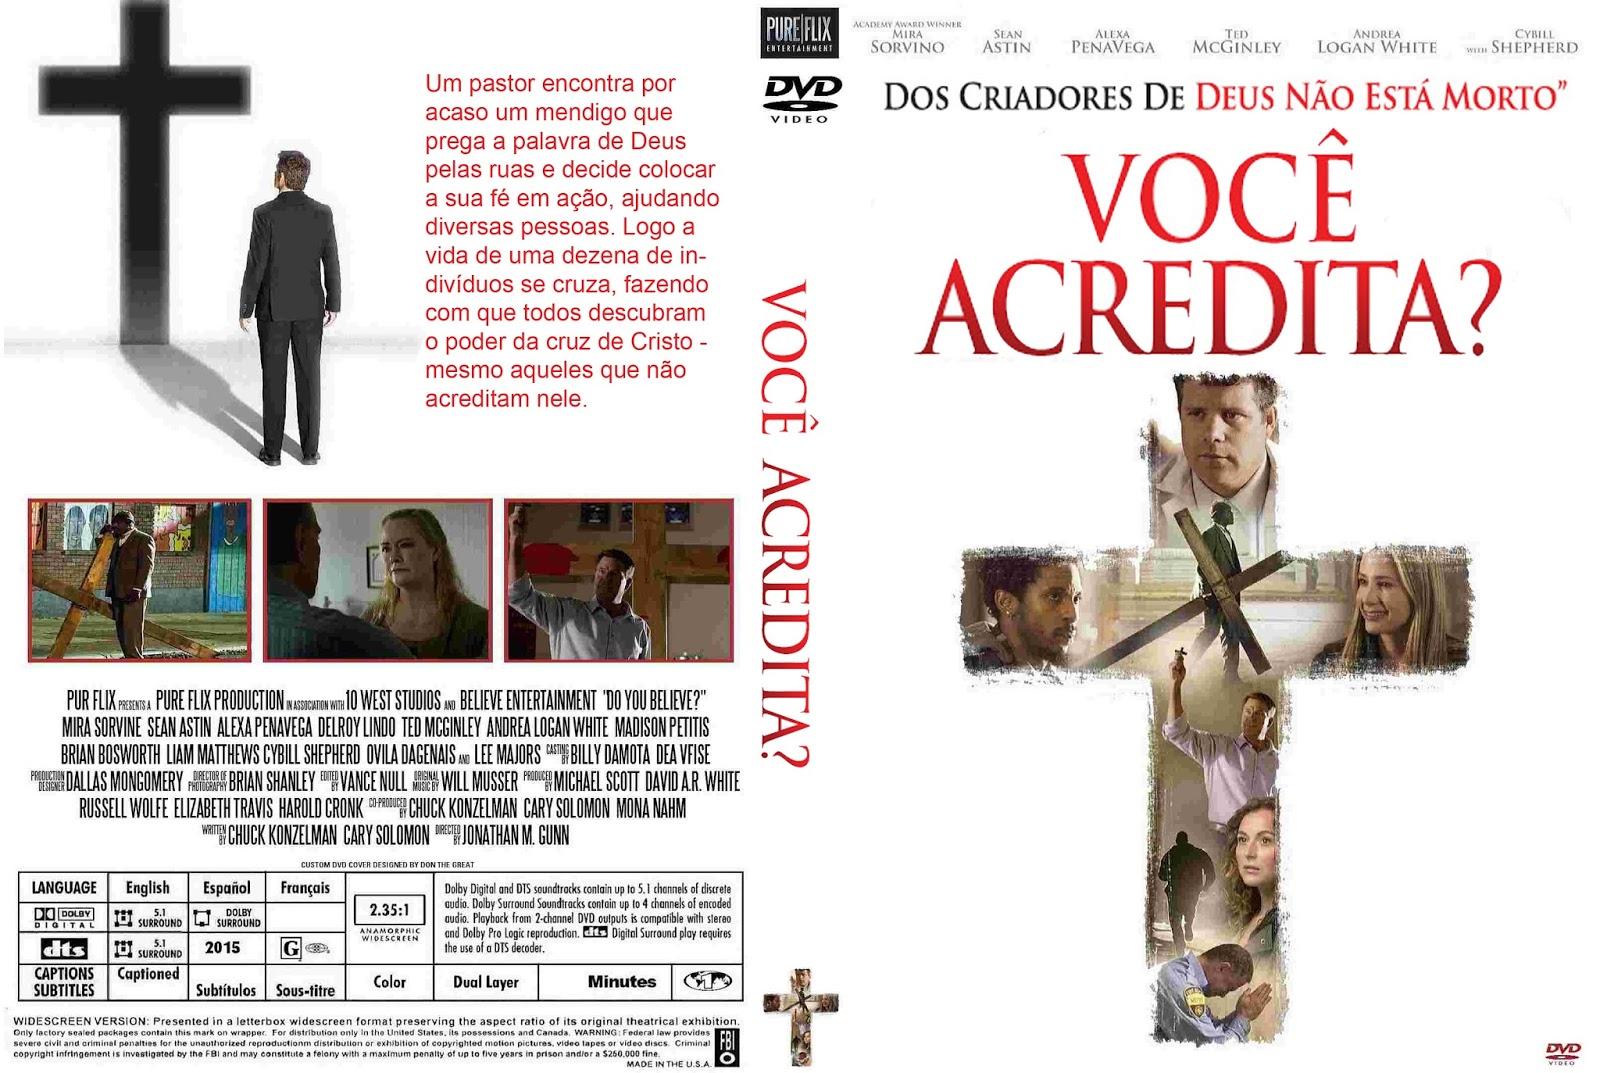 Download Você Acredita? BDRip XviD Dual Áudio Voc 25C3 25AA 2BAcredita